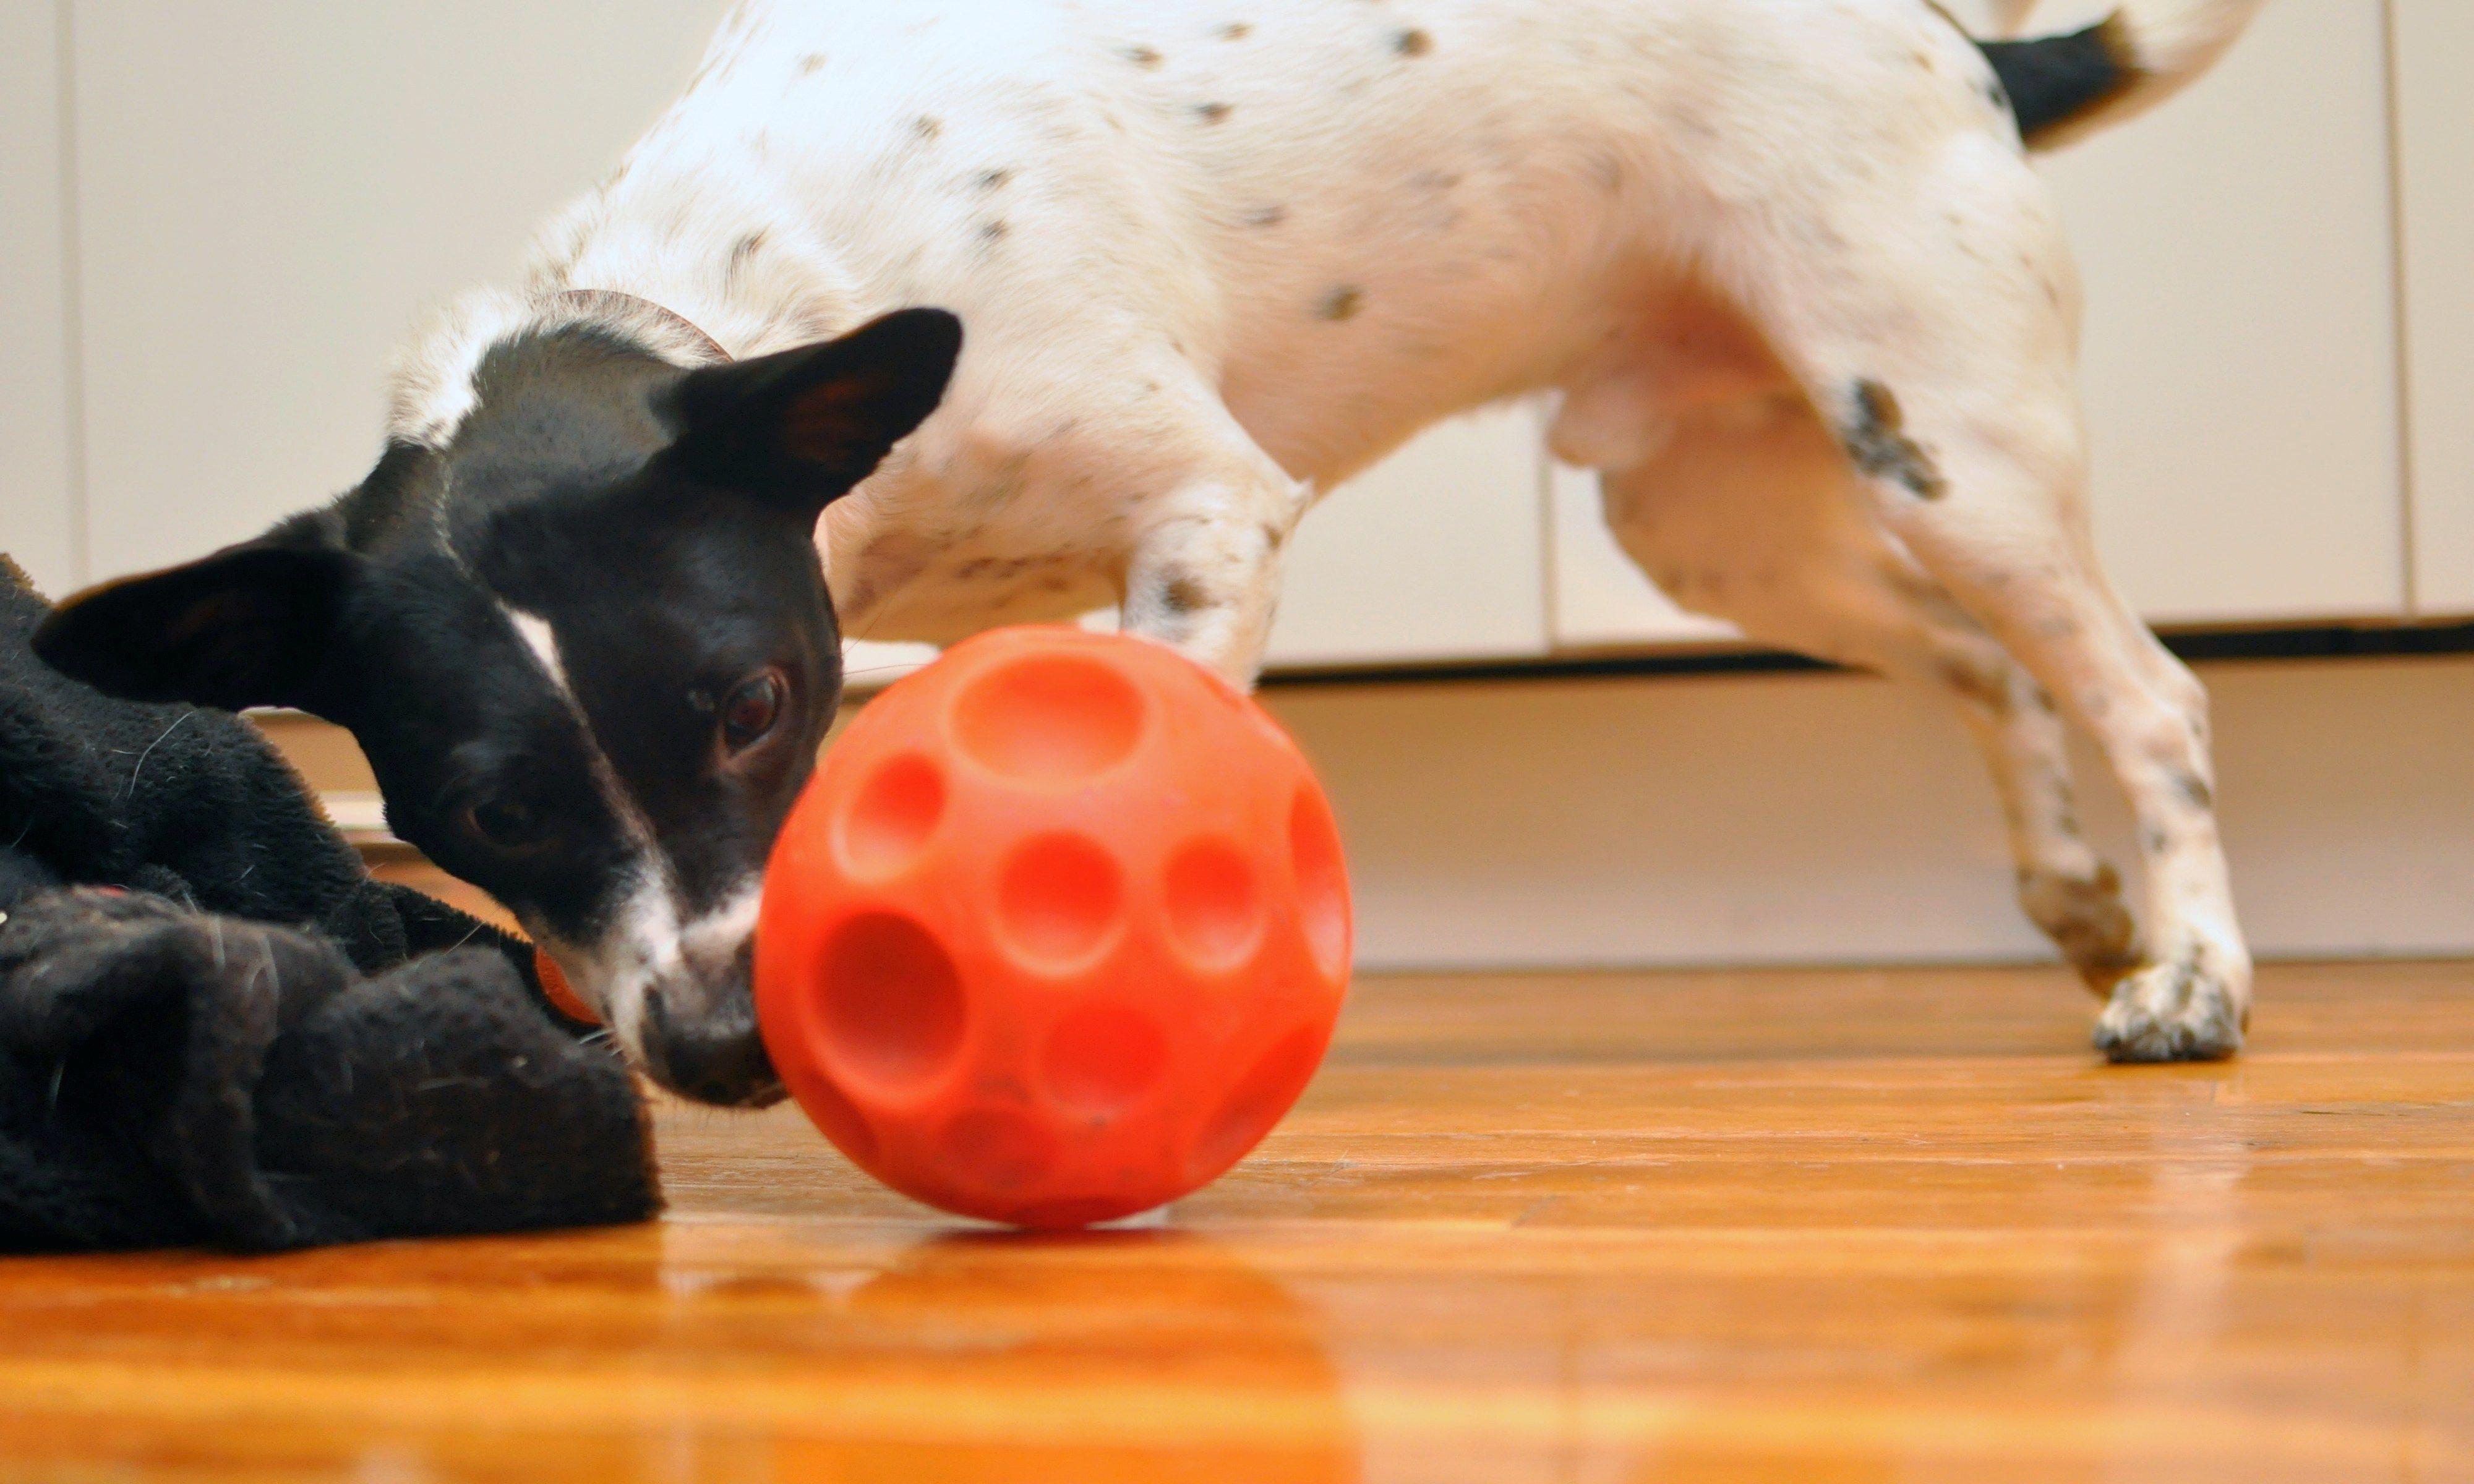 #cutestdogever #dogsrule #dogchild  #bostonterrierpuppy#aww #ILoveMyDog  #dogsofinstagram #dailyfluff